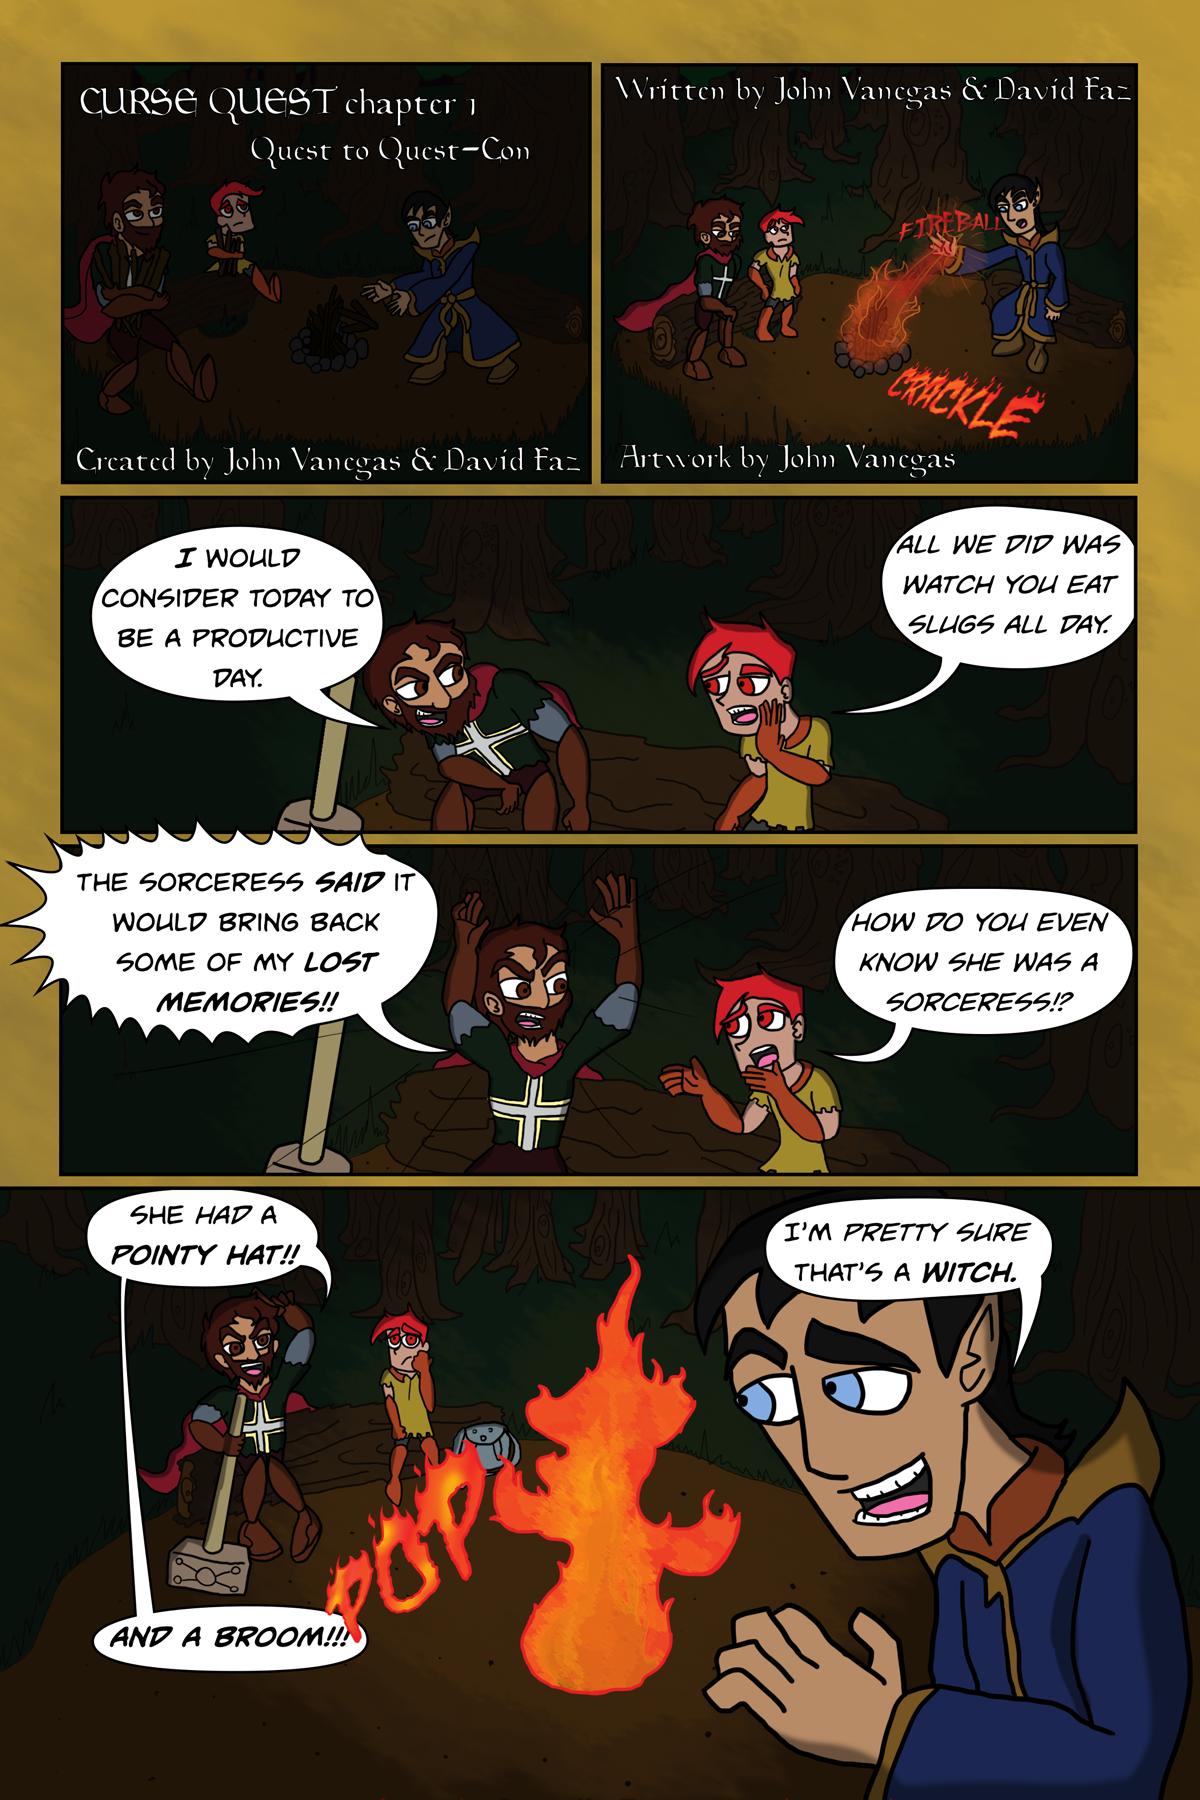 Curse Quest 1.1